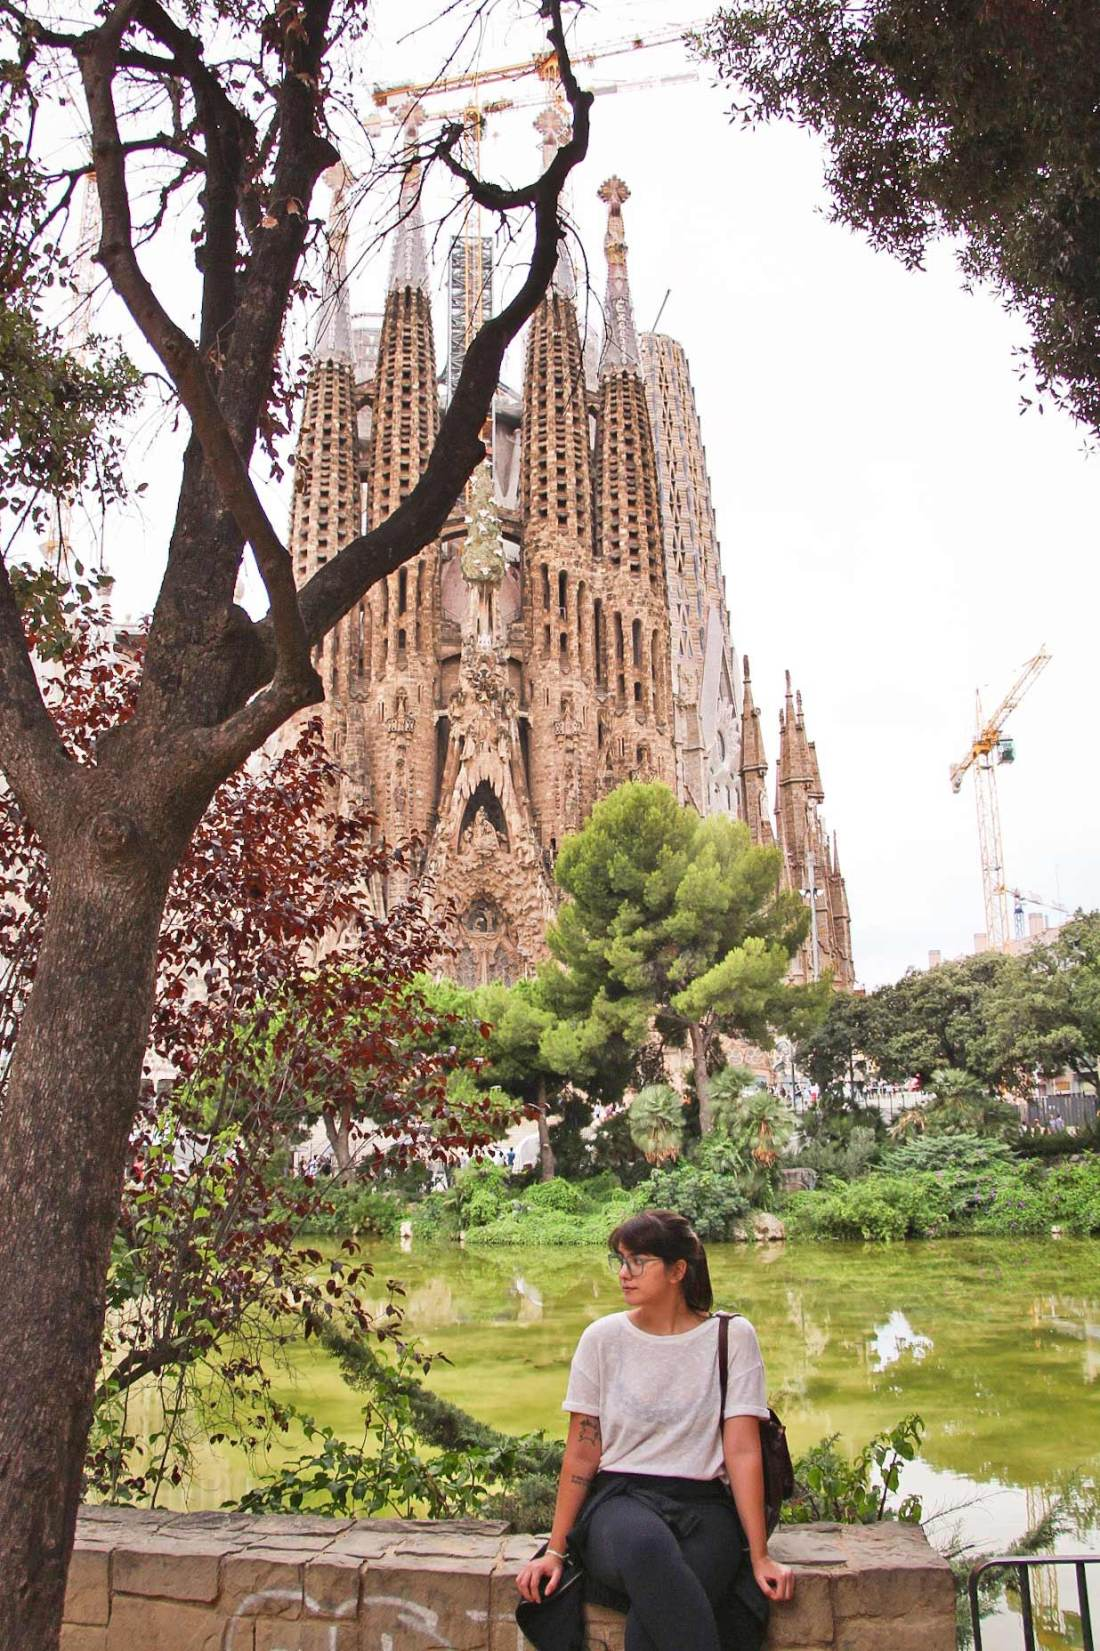 sagrada-familia-barcelona-coamotta-2